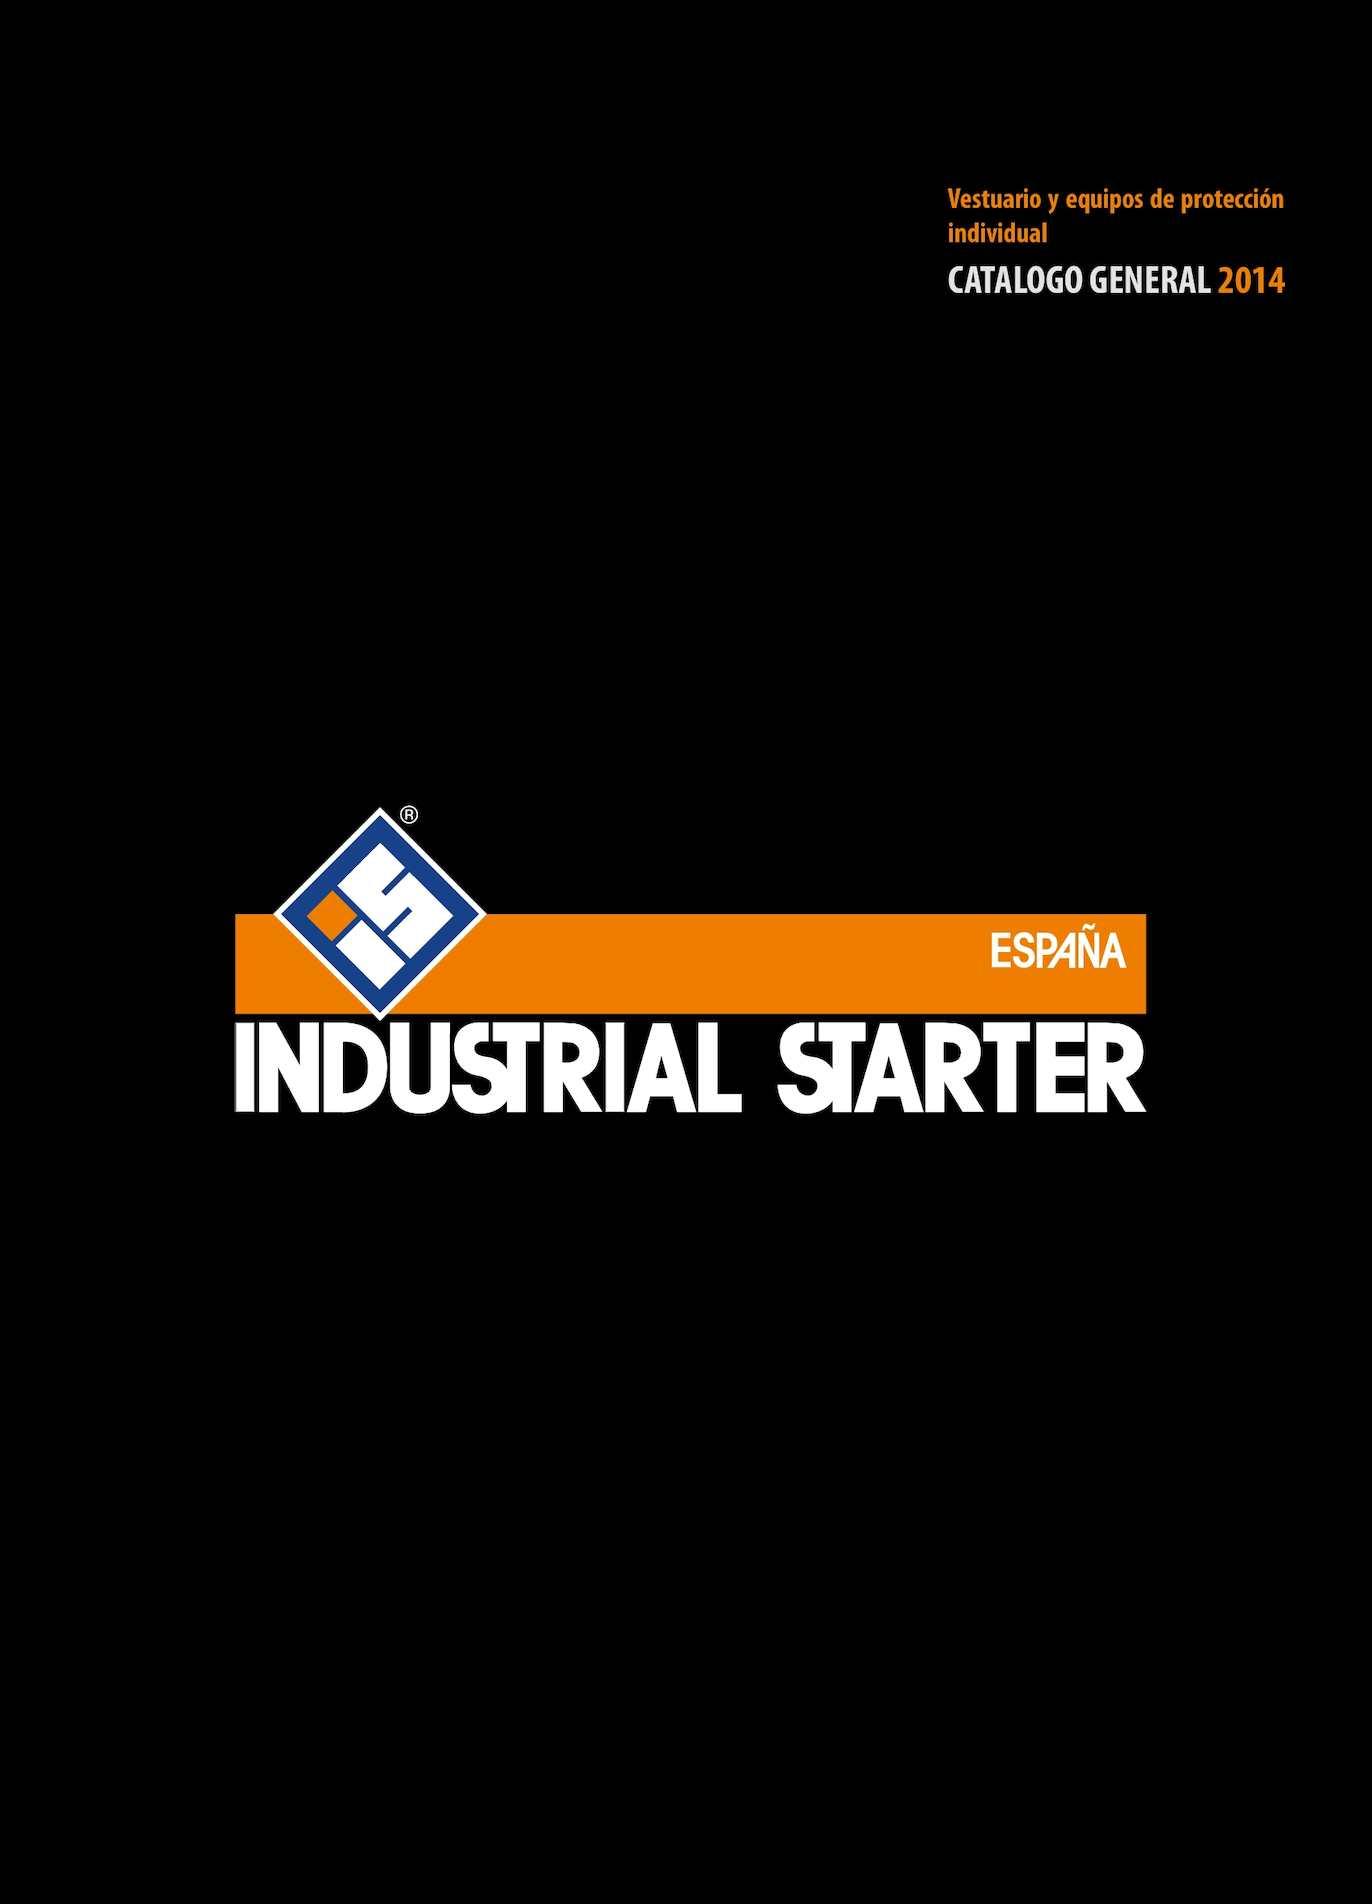 53b2fa0816c2 Calaméo - Industrial Starter 2014